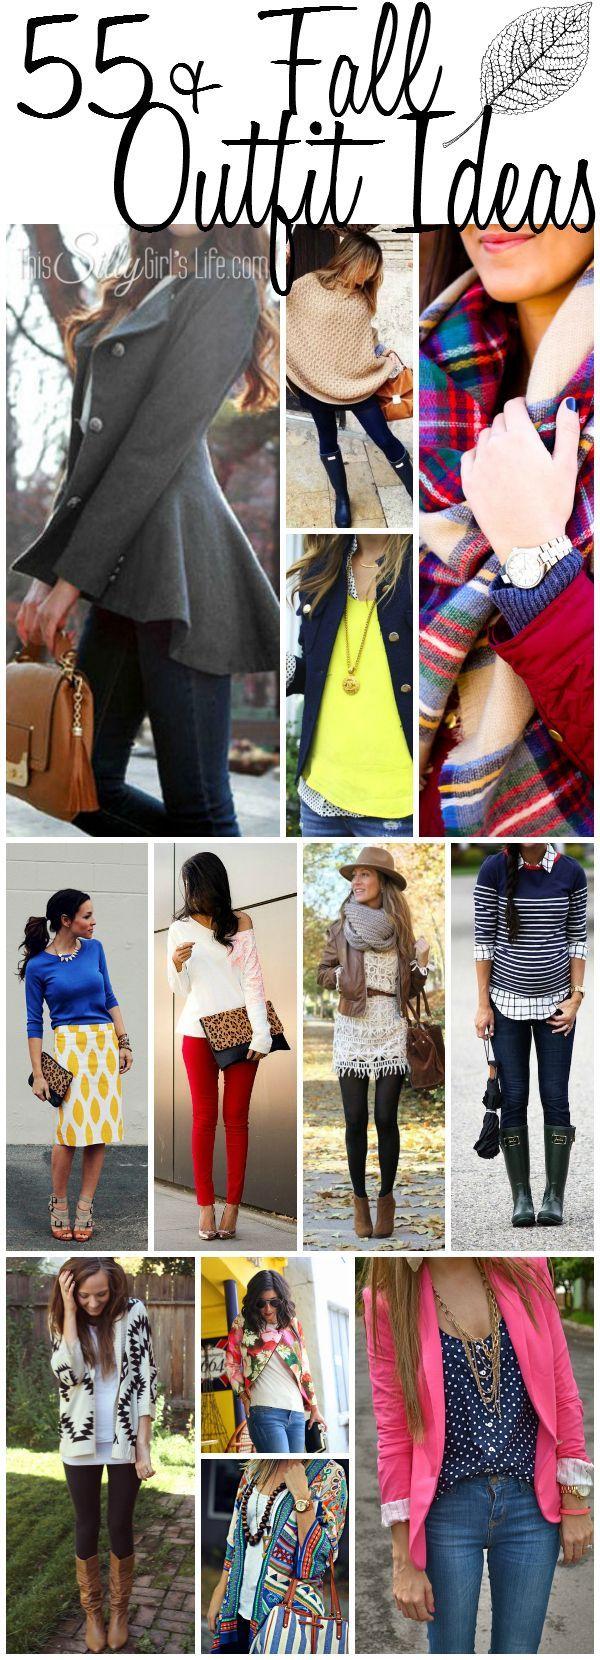 best clothing images on pinterest